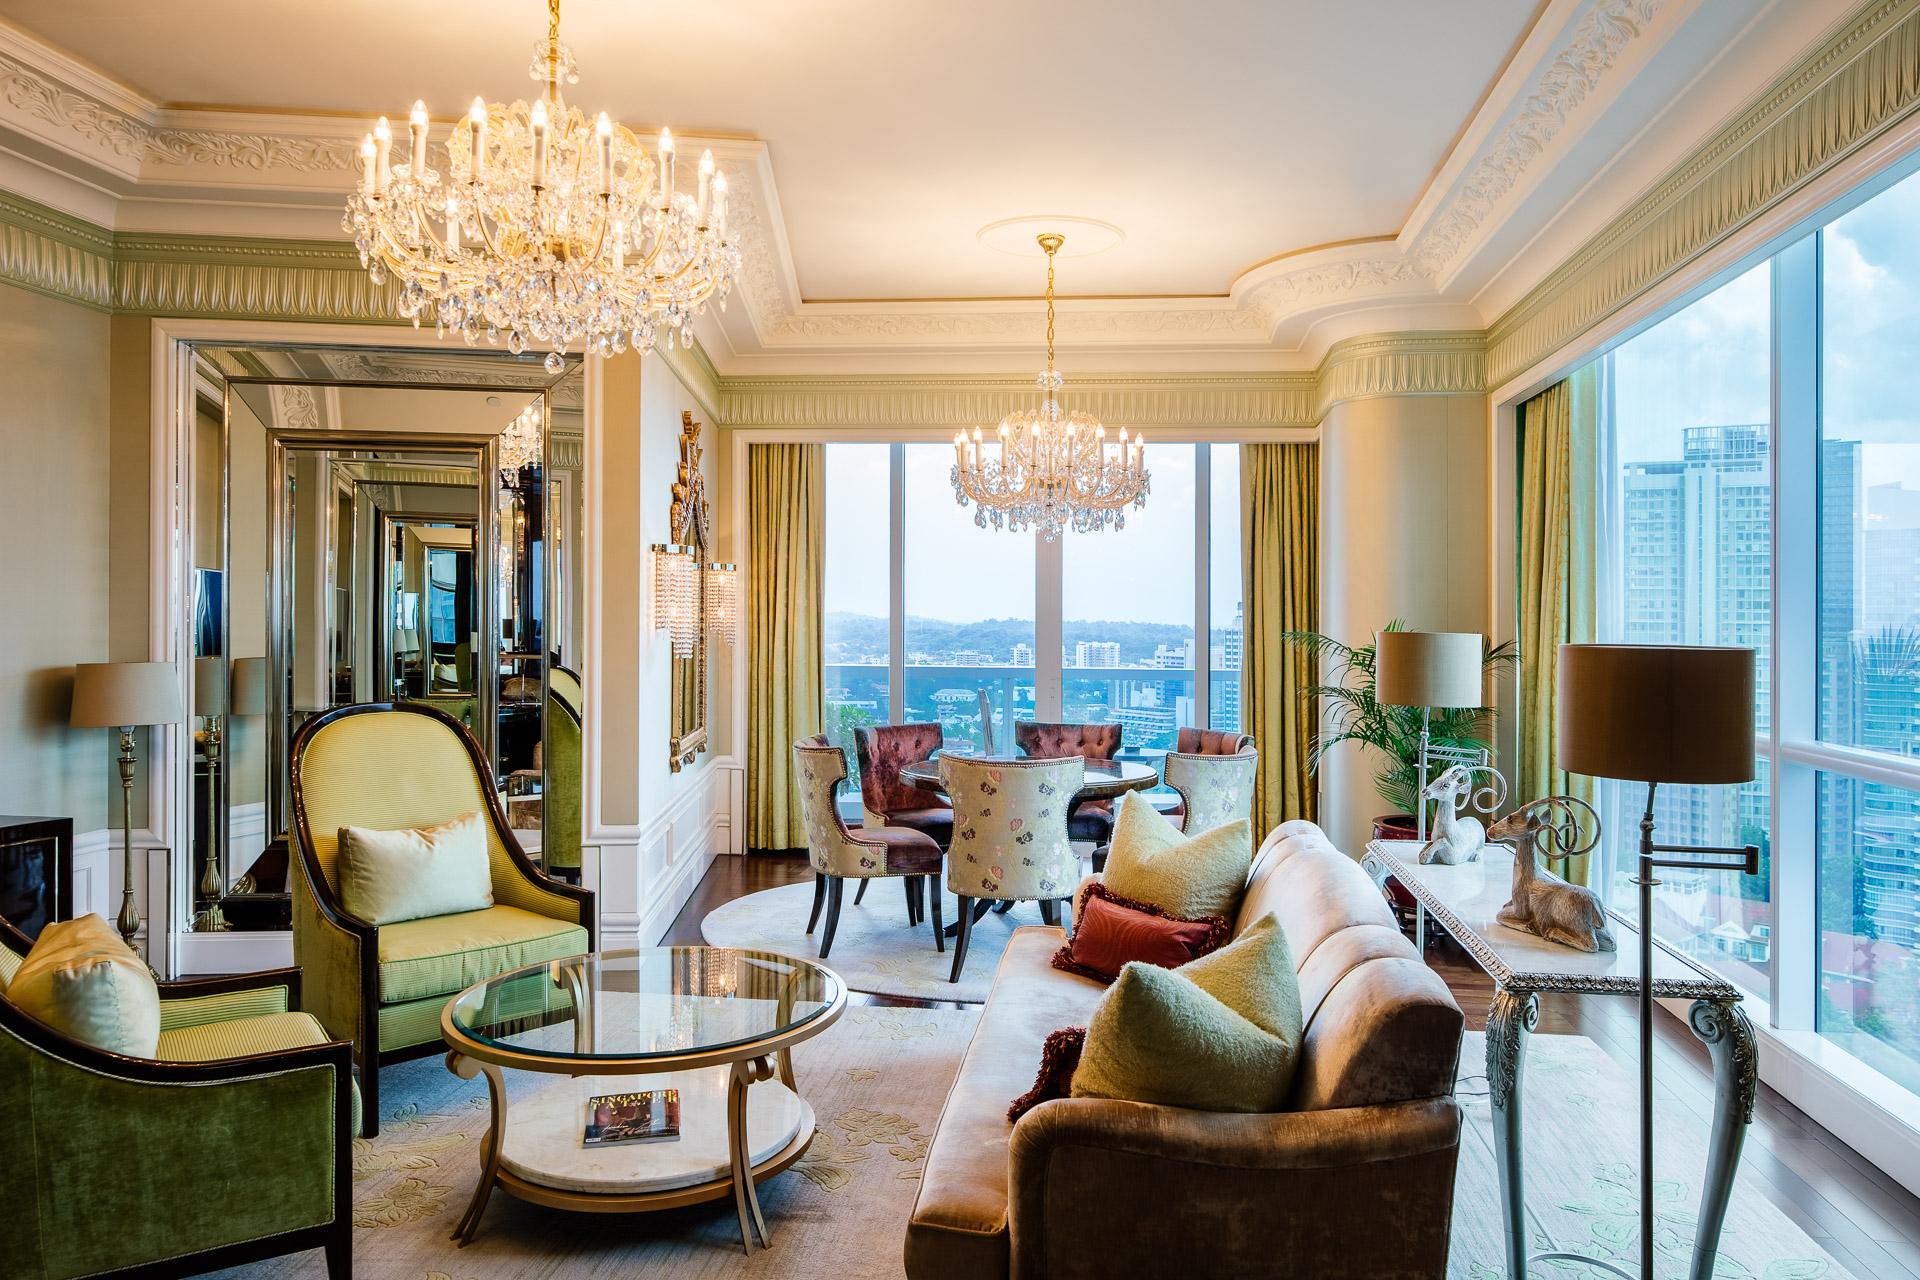 st-regis-singapore-marriott-luxury-hotel-photographer-24.jpg